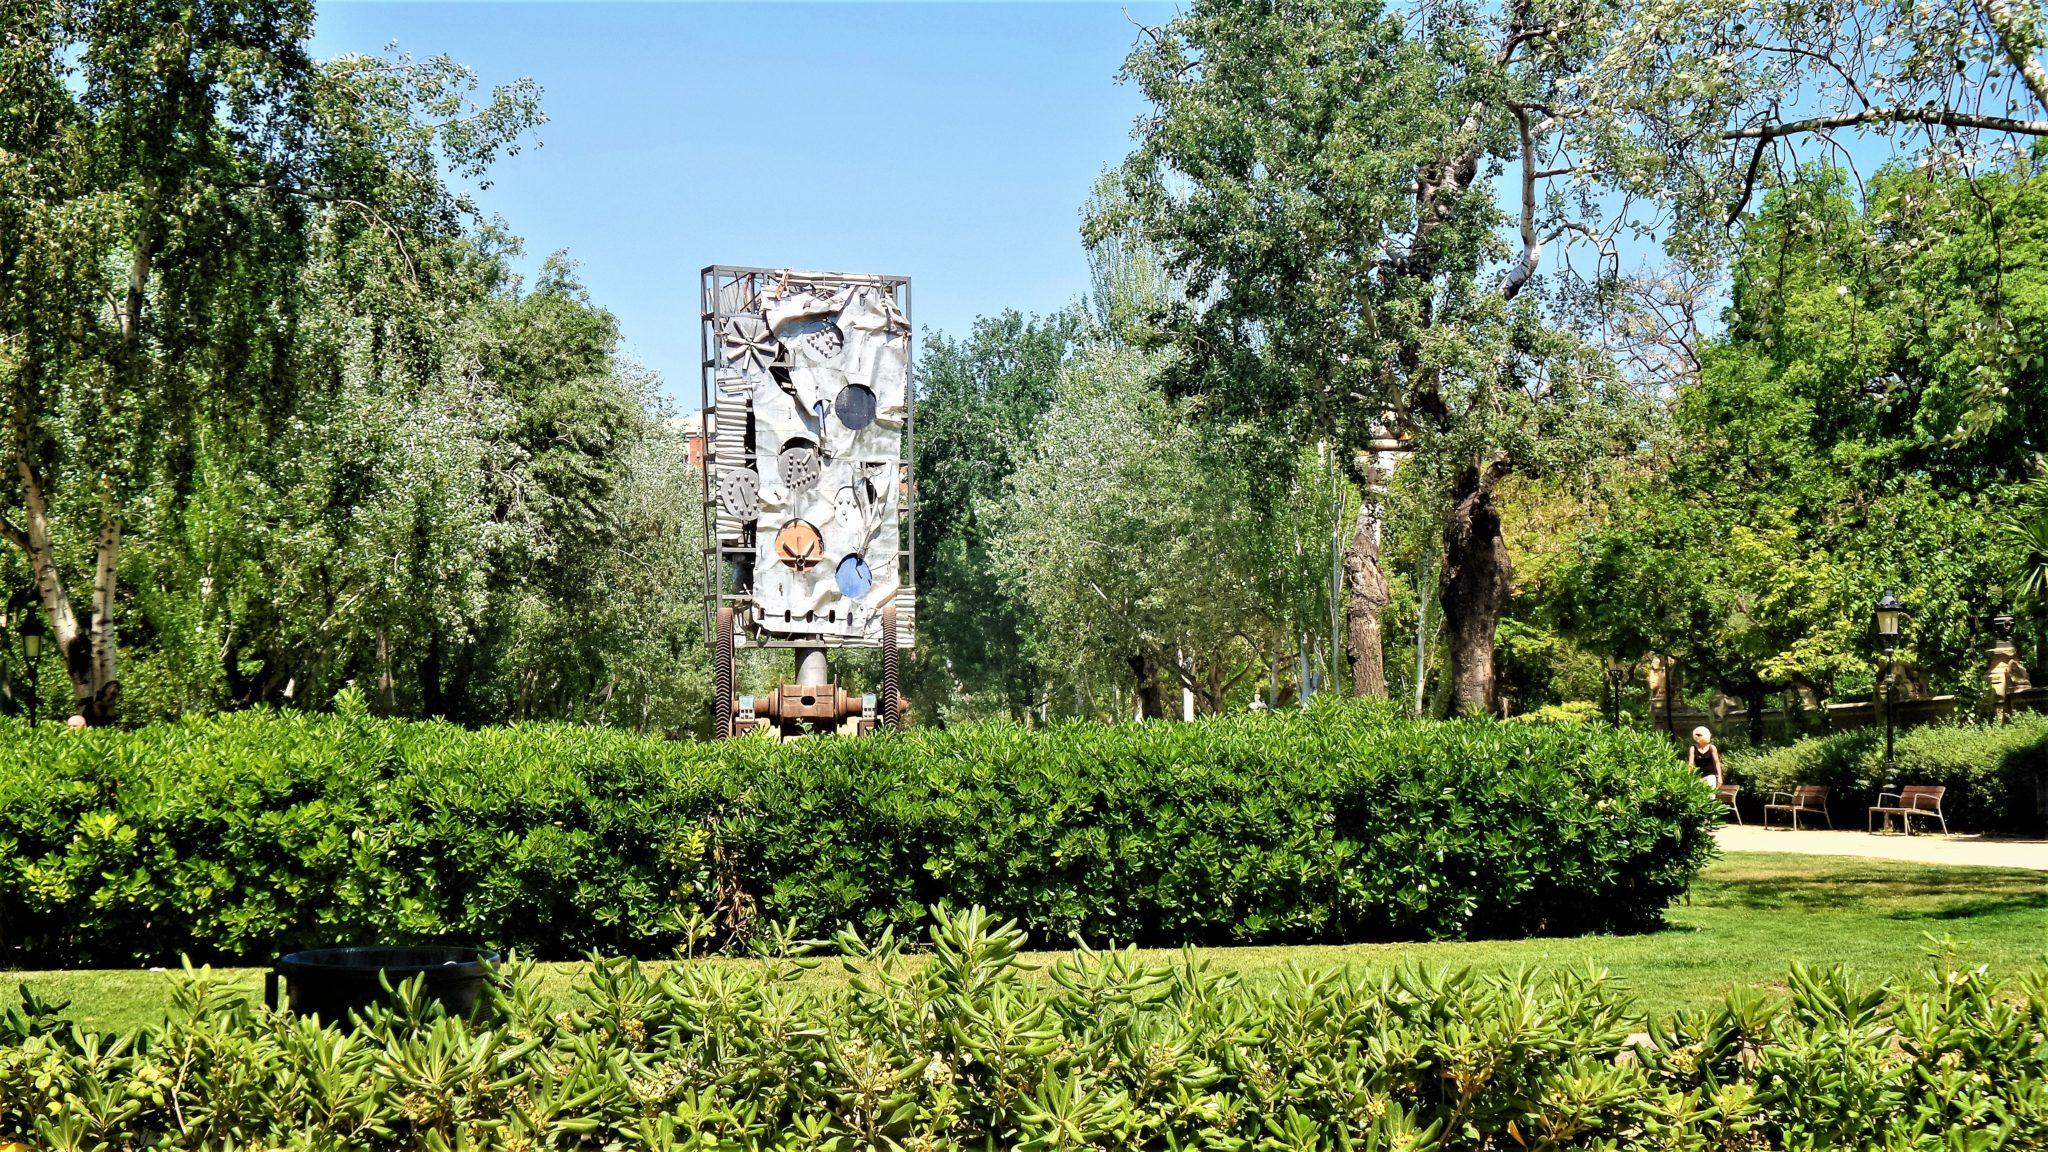 Ciutadella Park sculpture, Barcelona, Spain